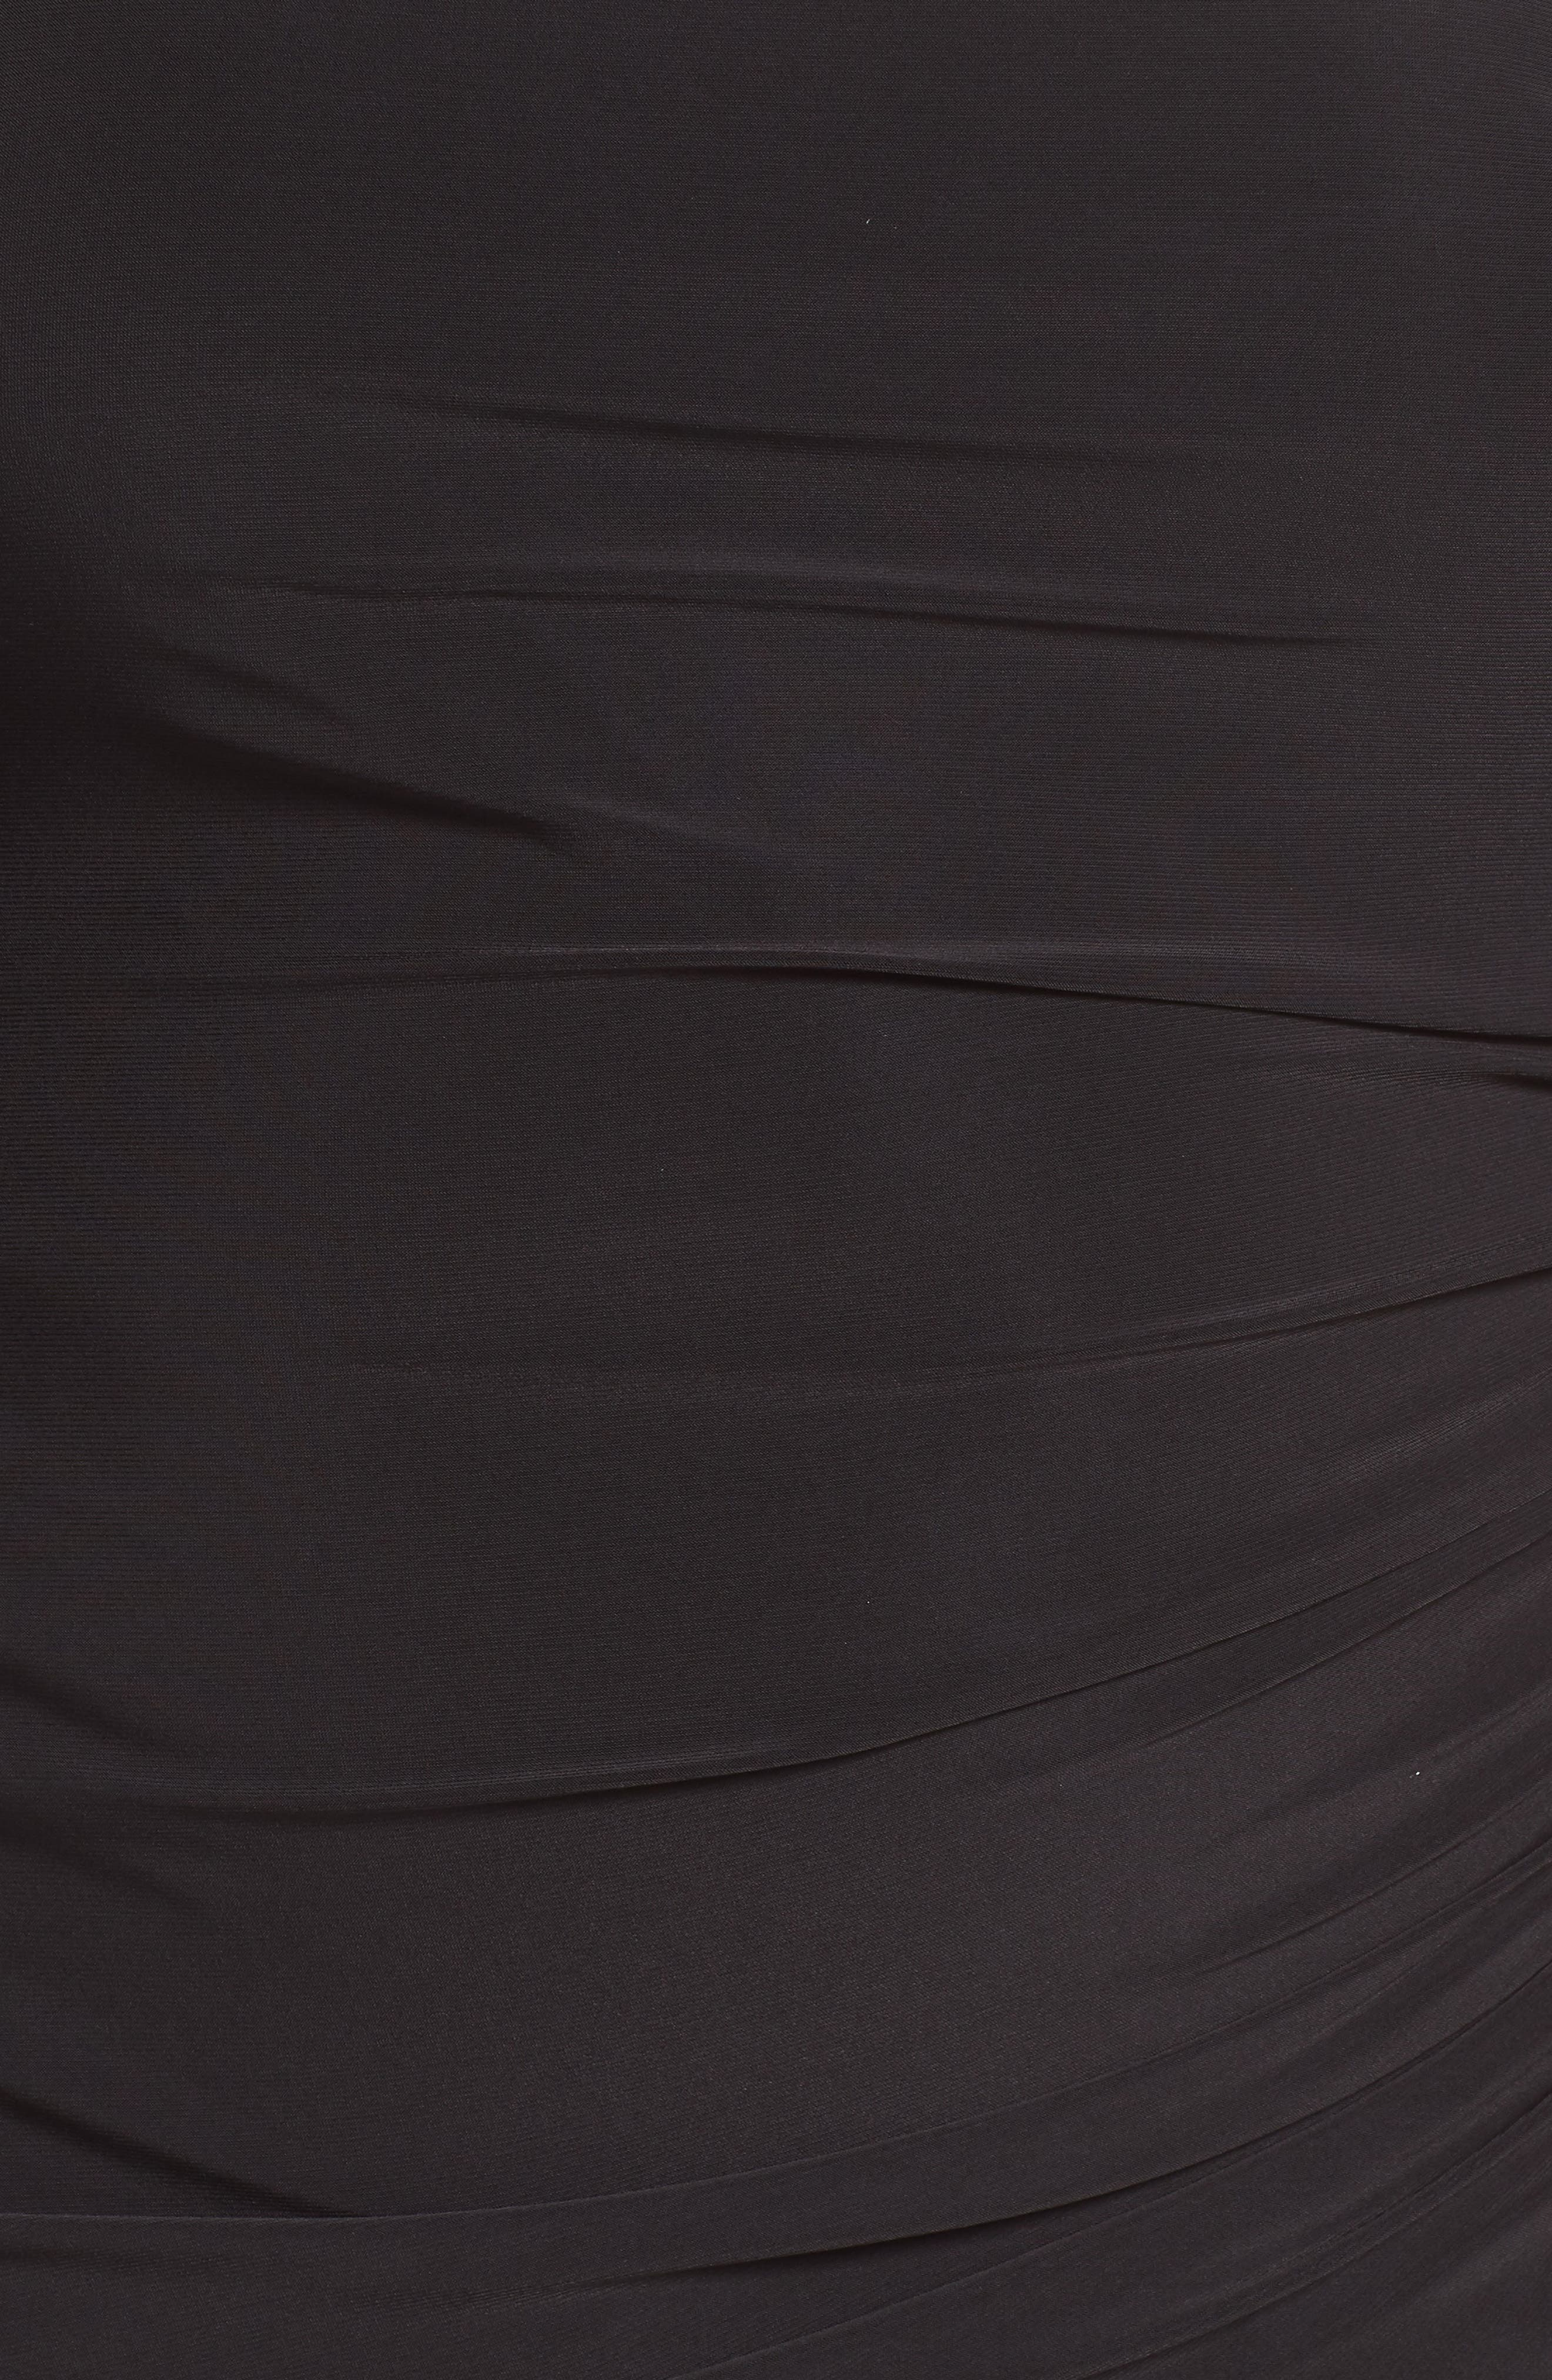 Cold Shoulder Sparkle Dress,                             Alternate thumbnail 6, color,                             BLACK/ SILVER